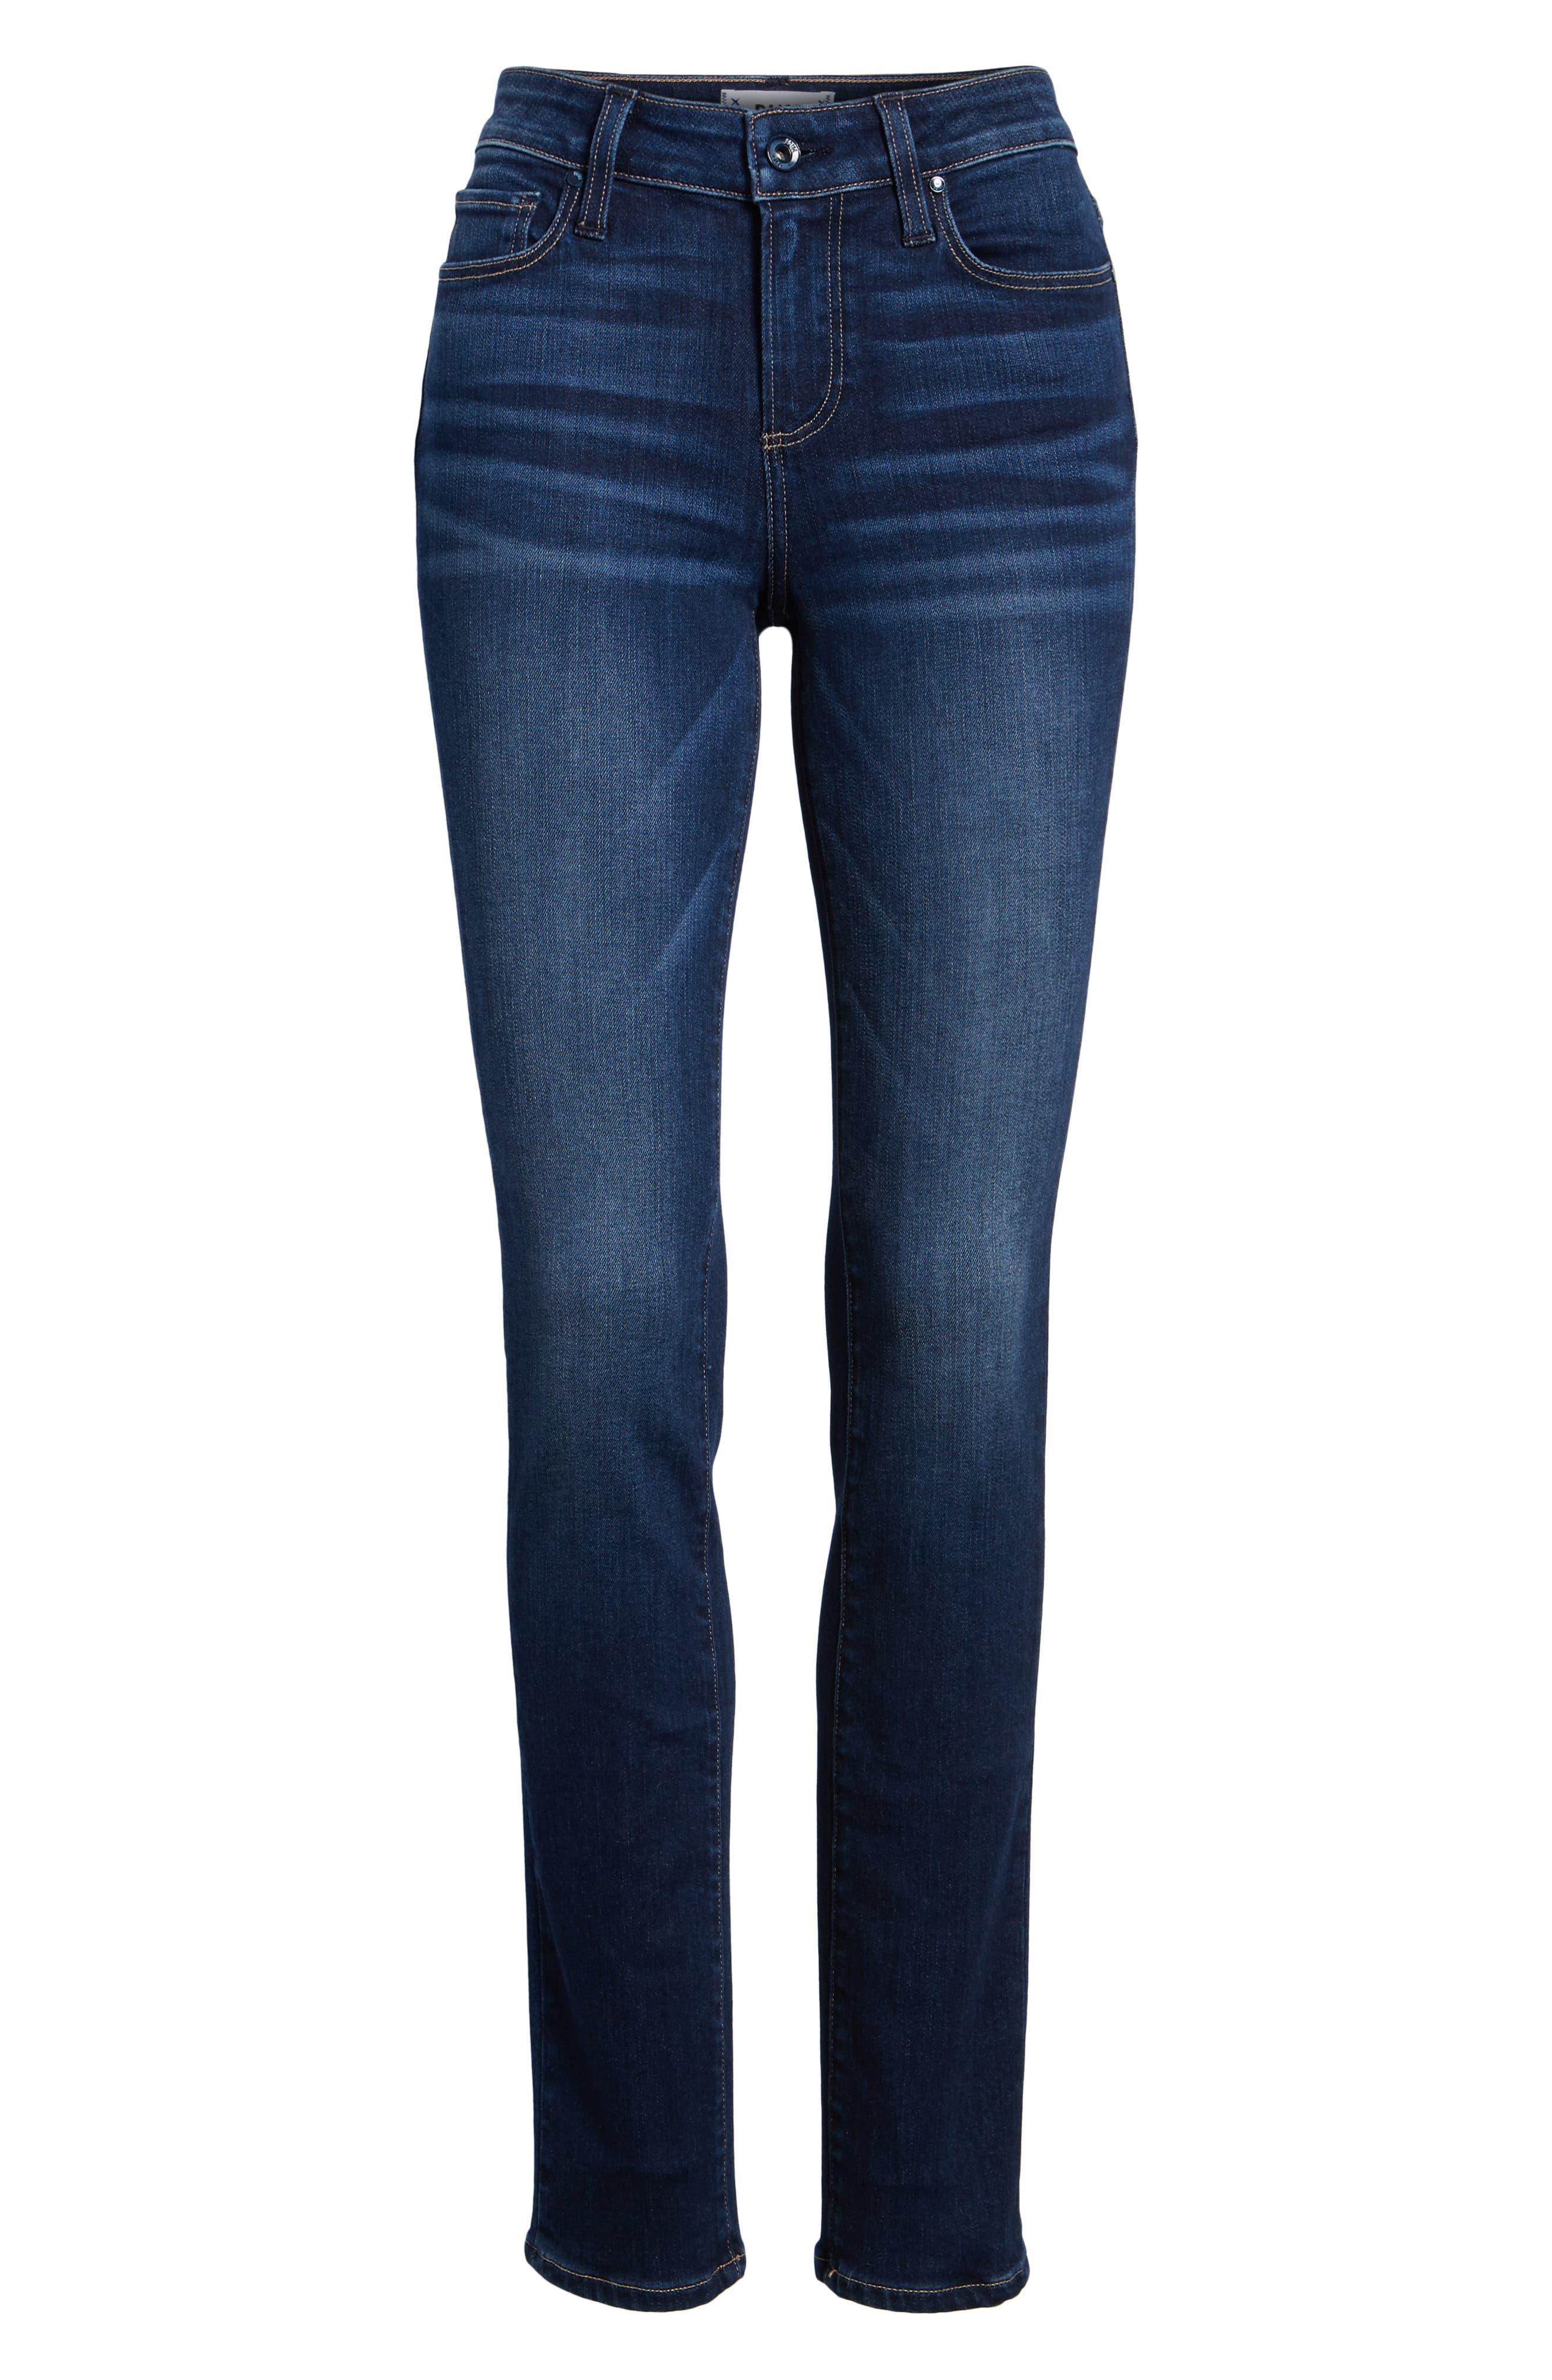 Skyline Skinny Jeans,                             Alternate thumbnail 7, color,                             IDLEWILD